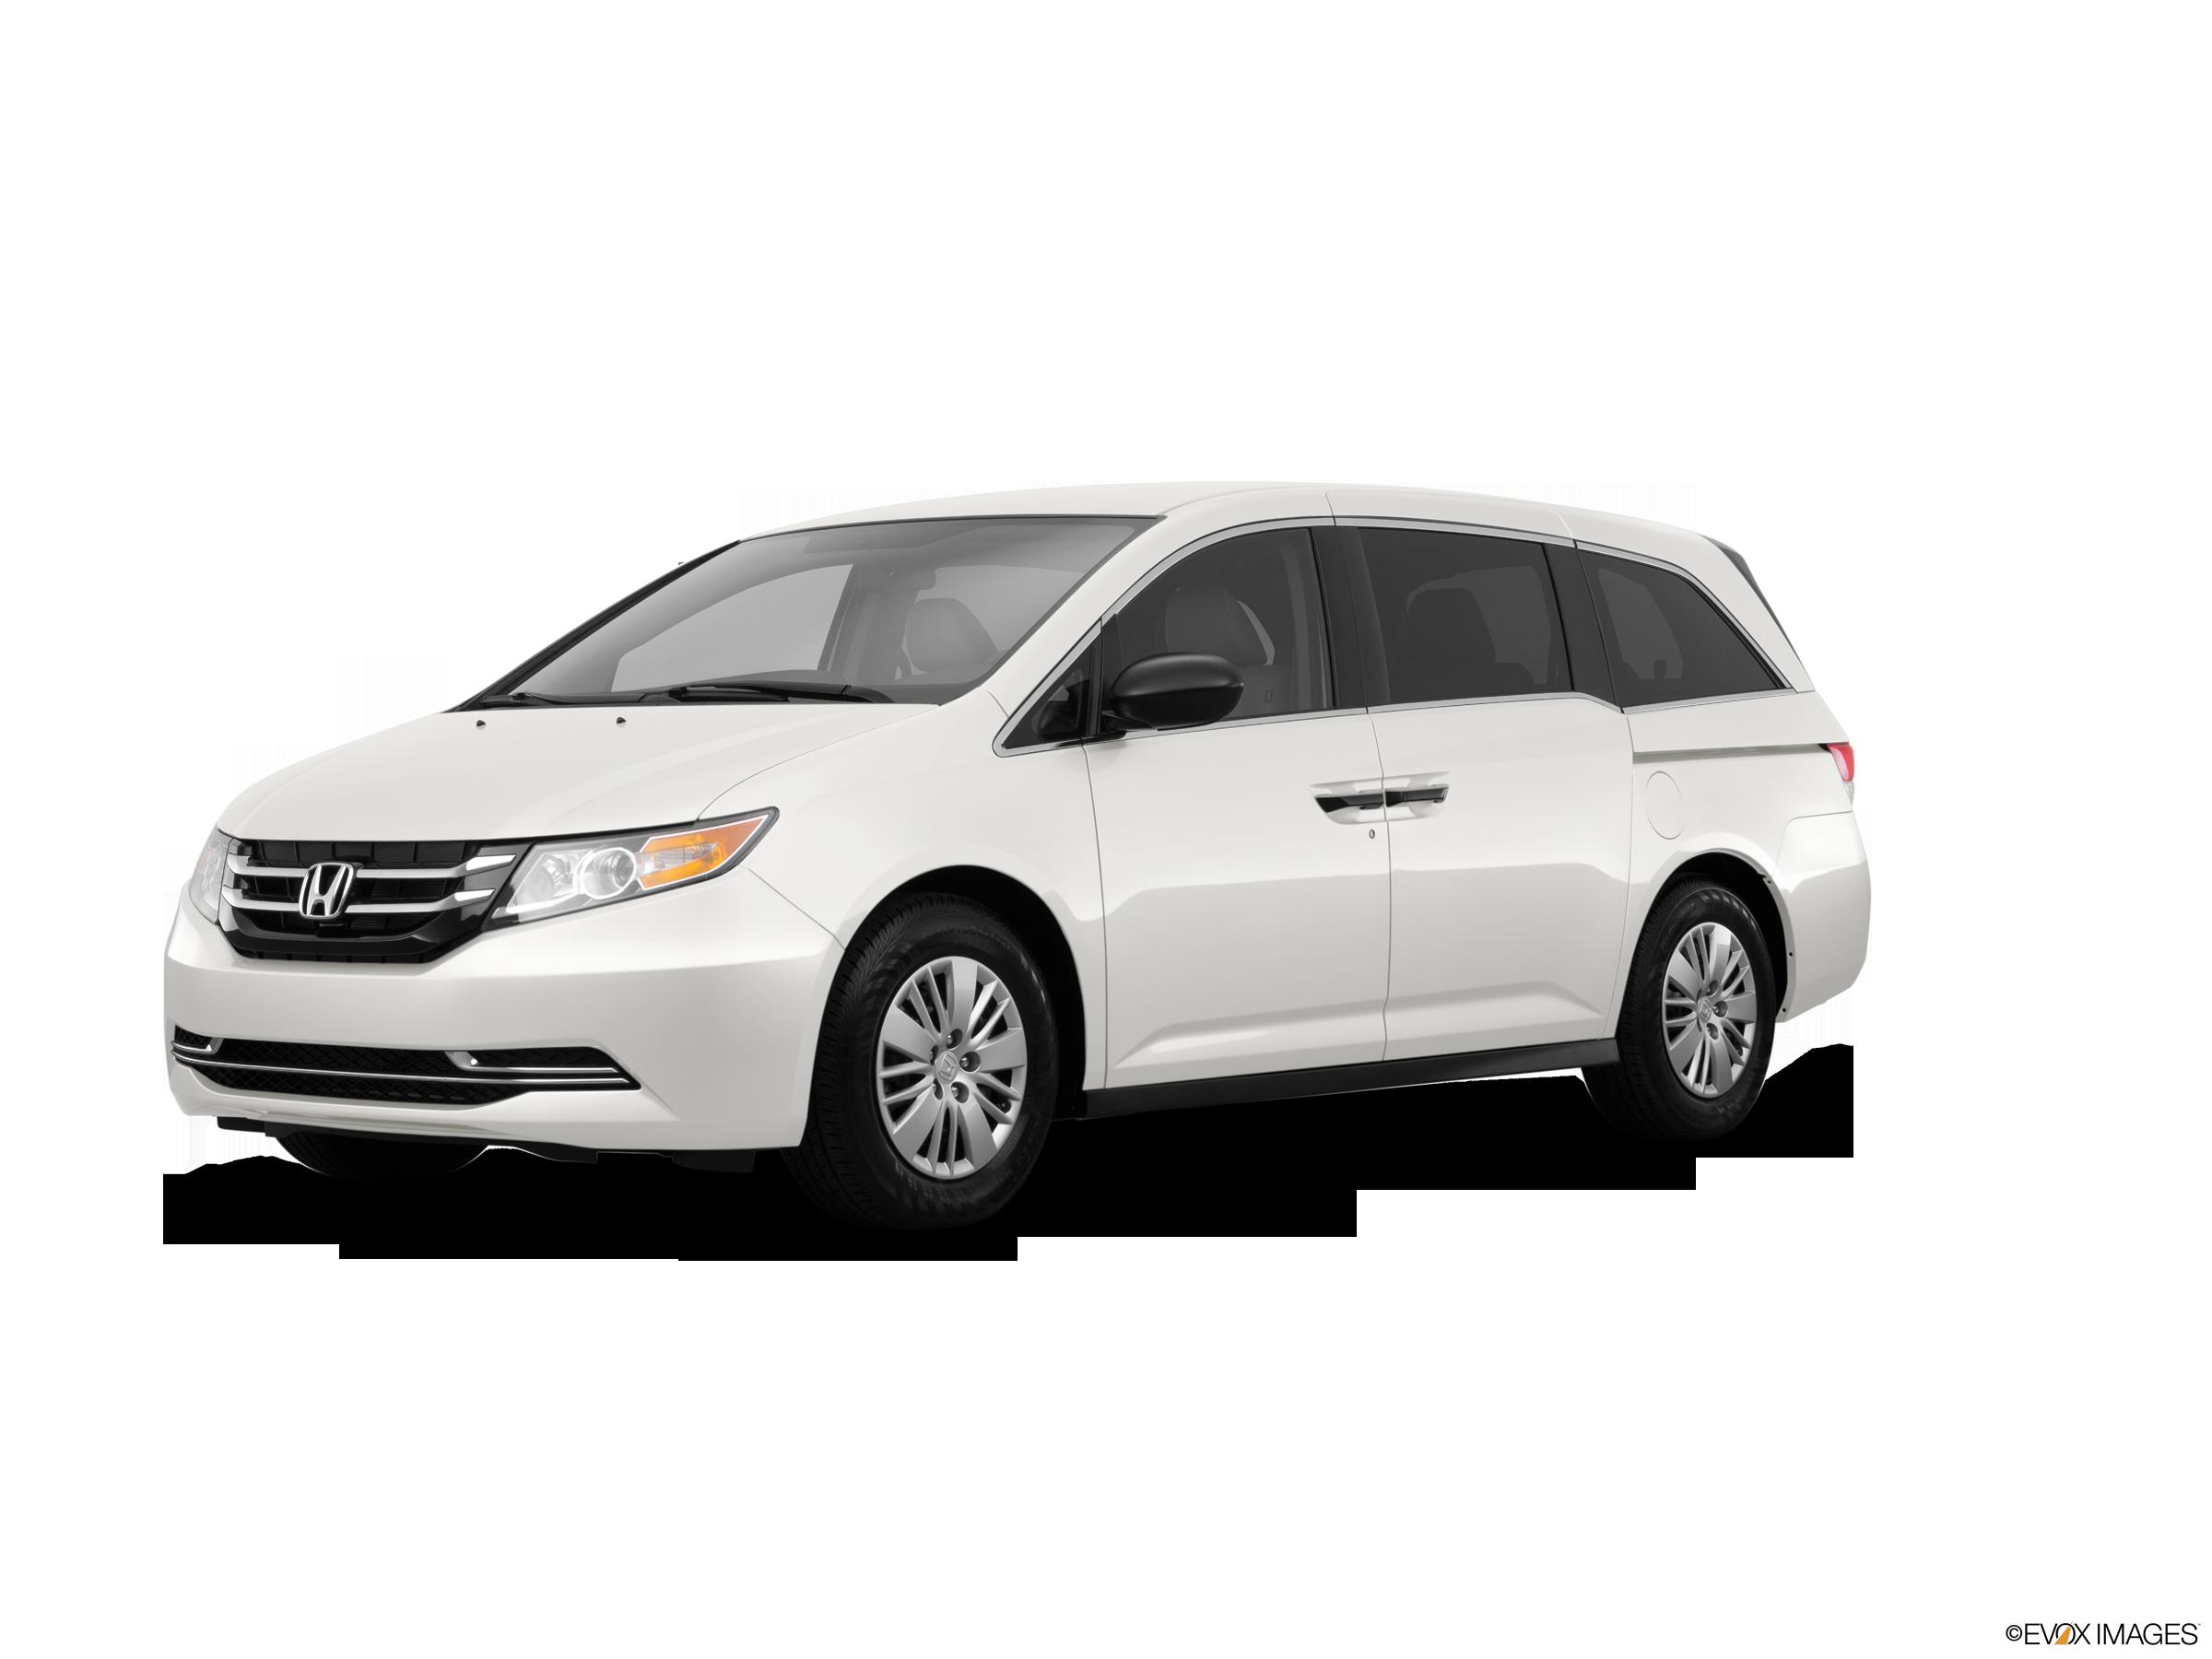 Kekurangan Honda Odyssey 2015 Spesifikasi